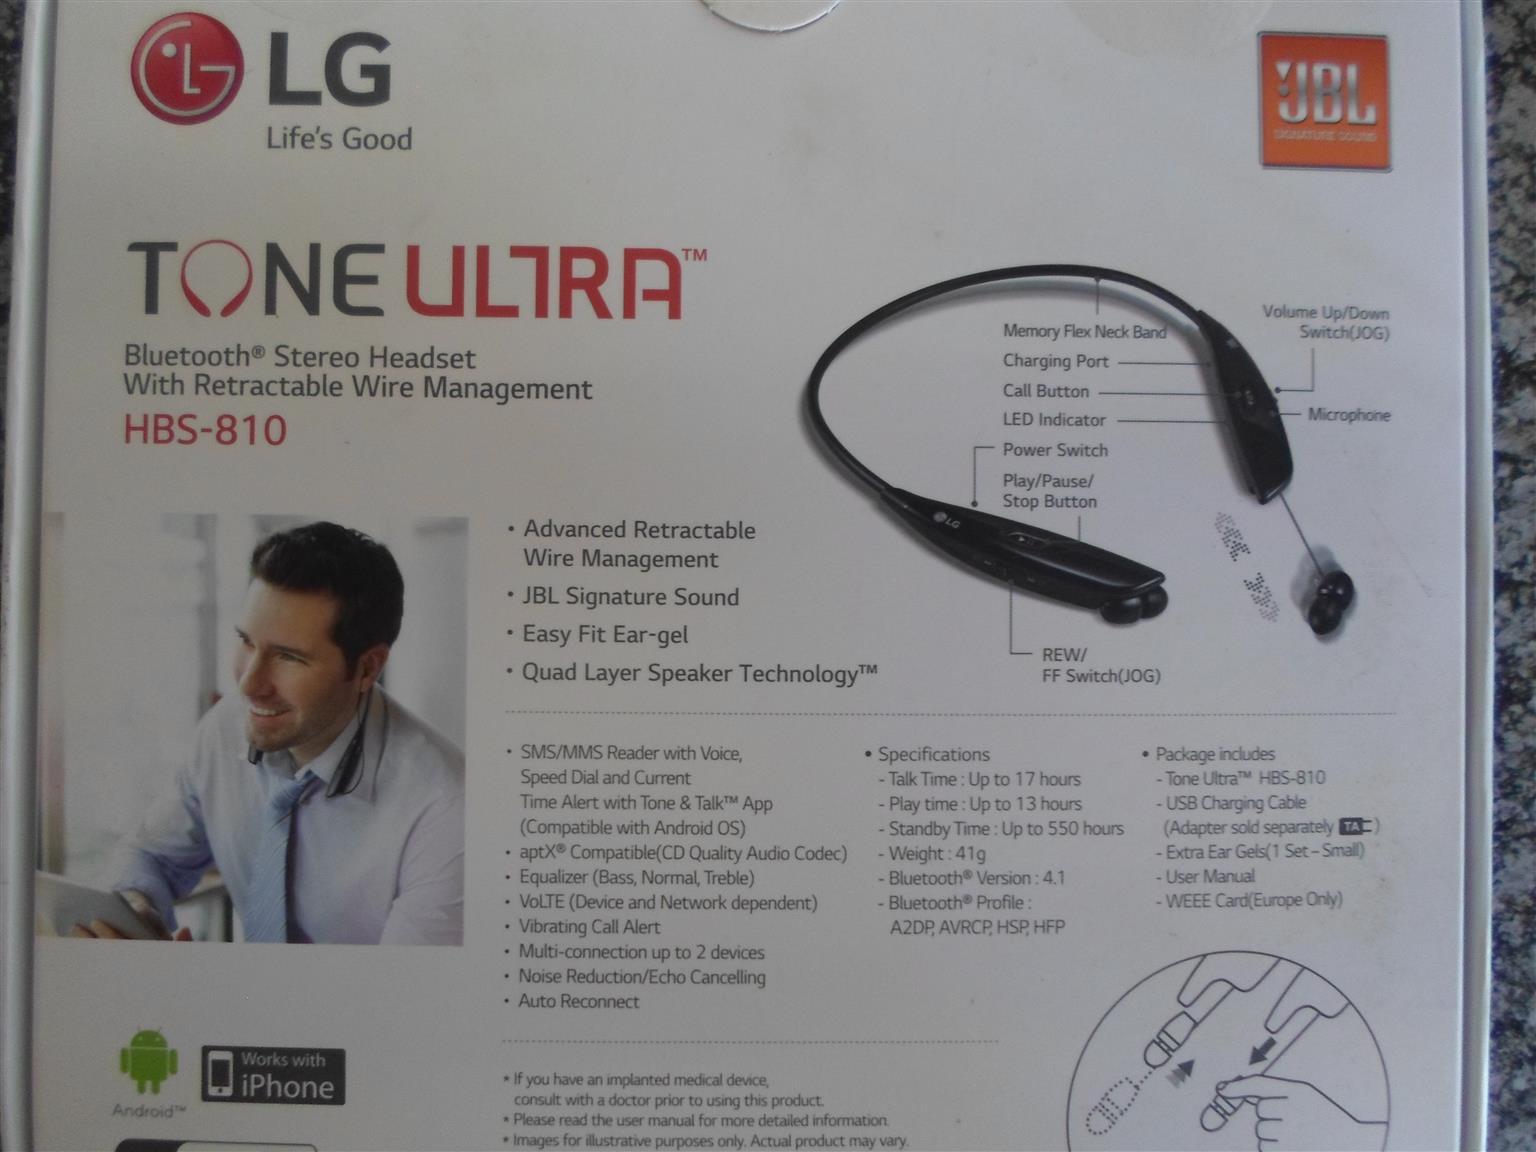 LG Bluetooth Stereo Headset